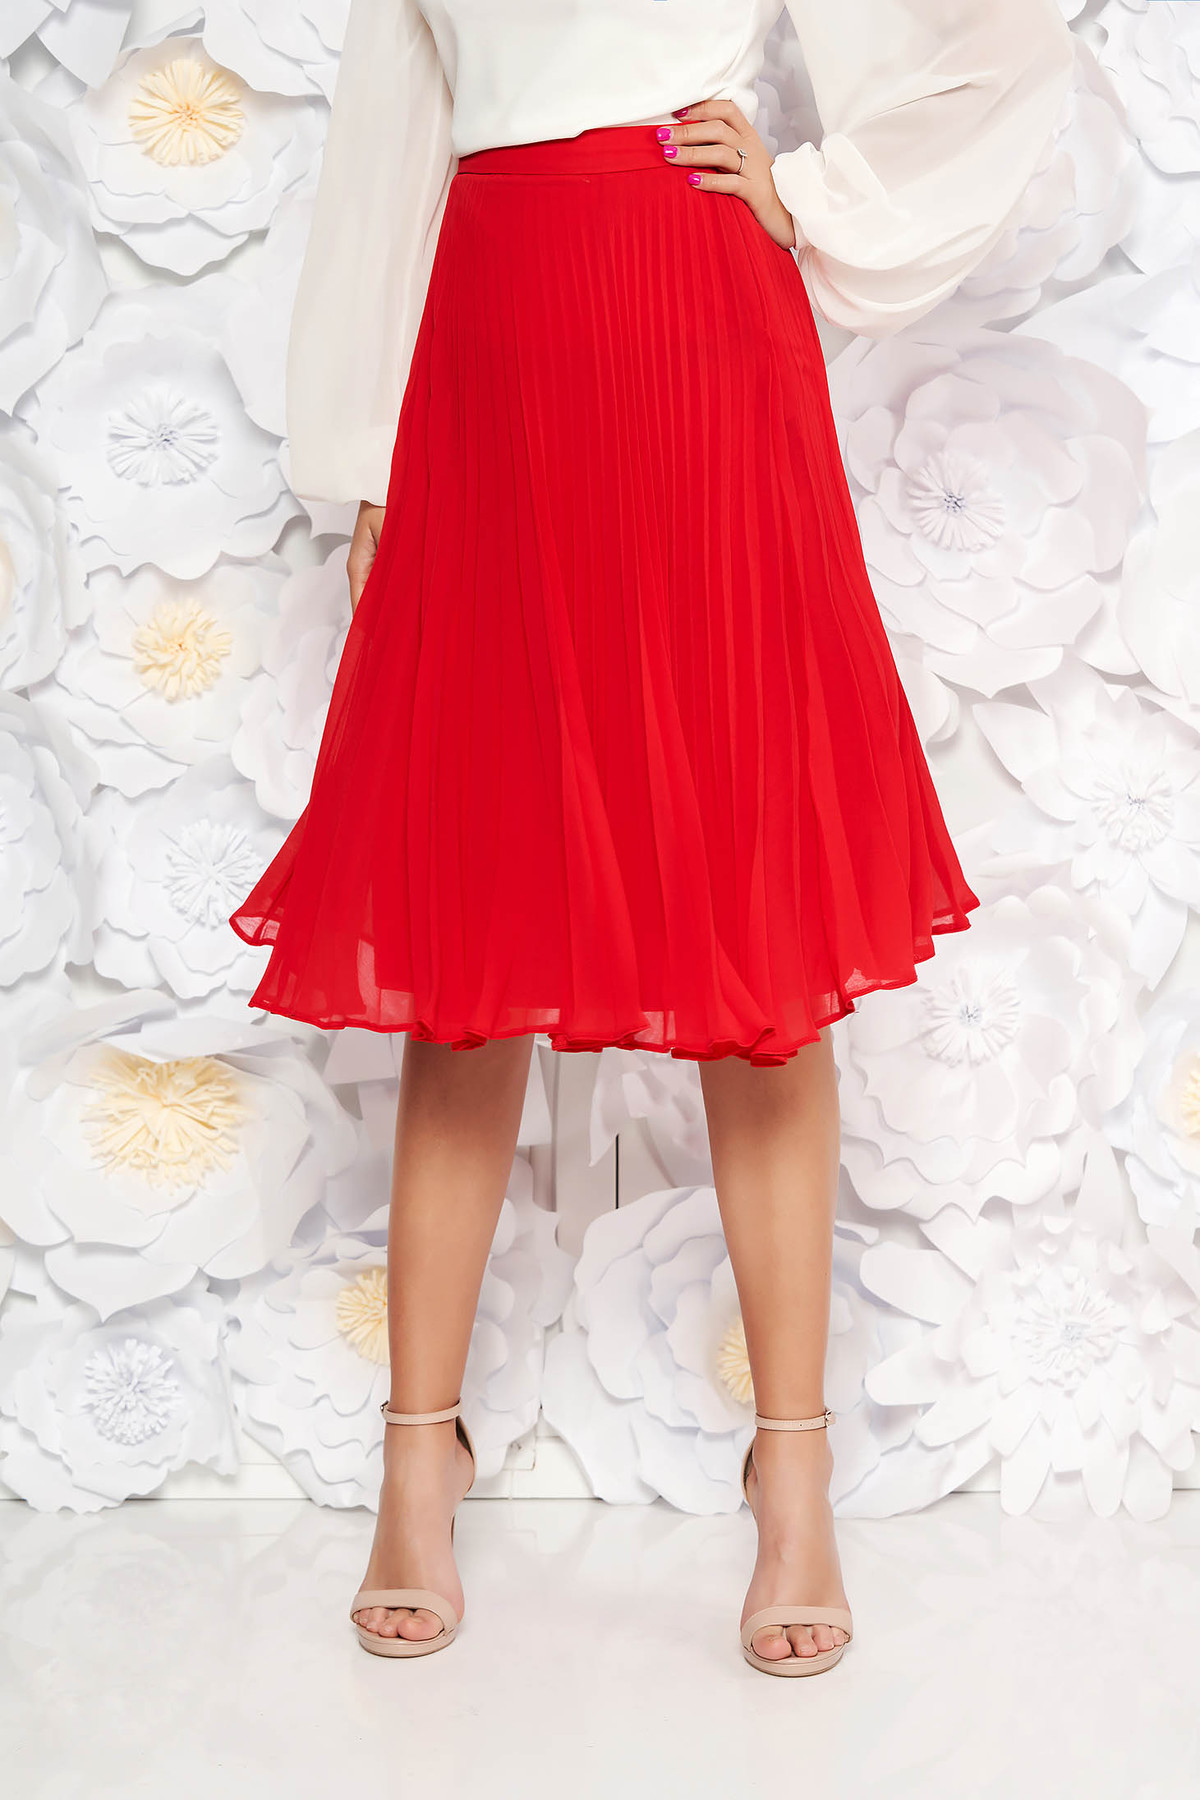 Fusta rosie StarShinerS eleganta in clos plisata cu talie medie din voal